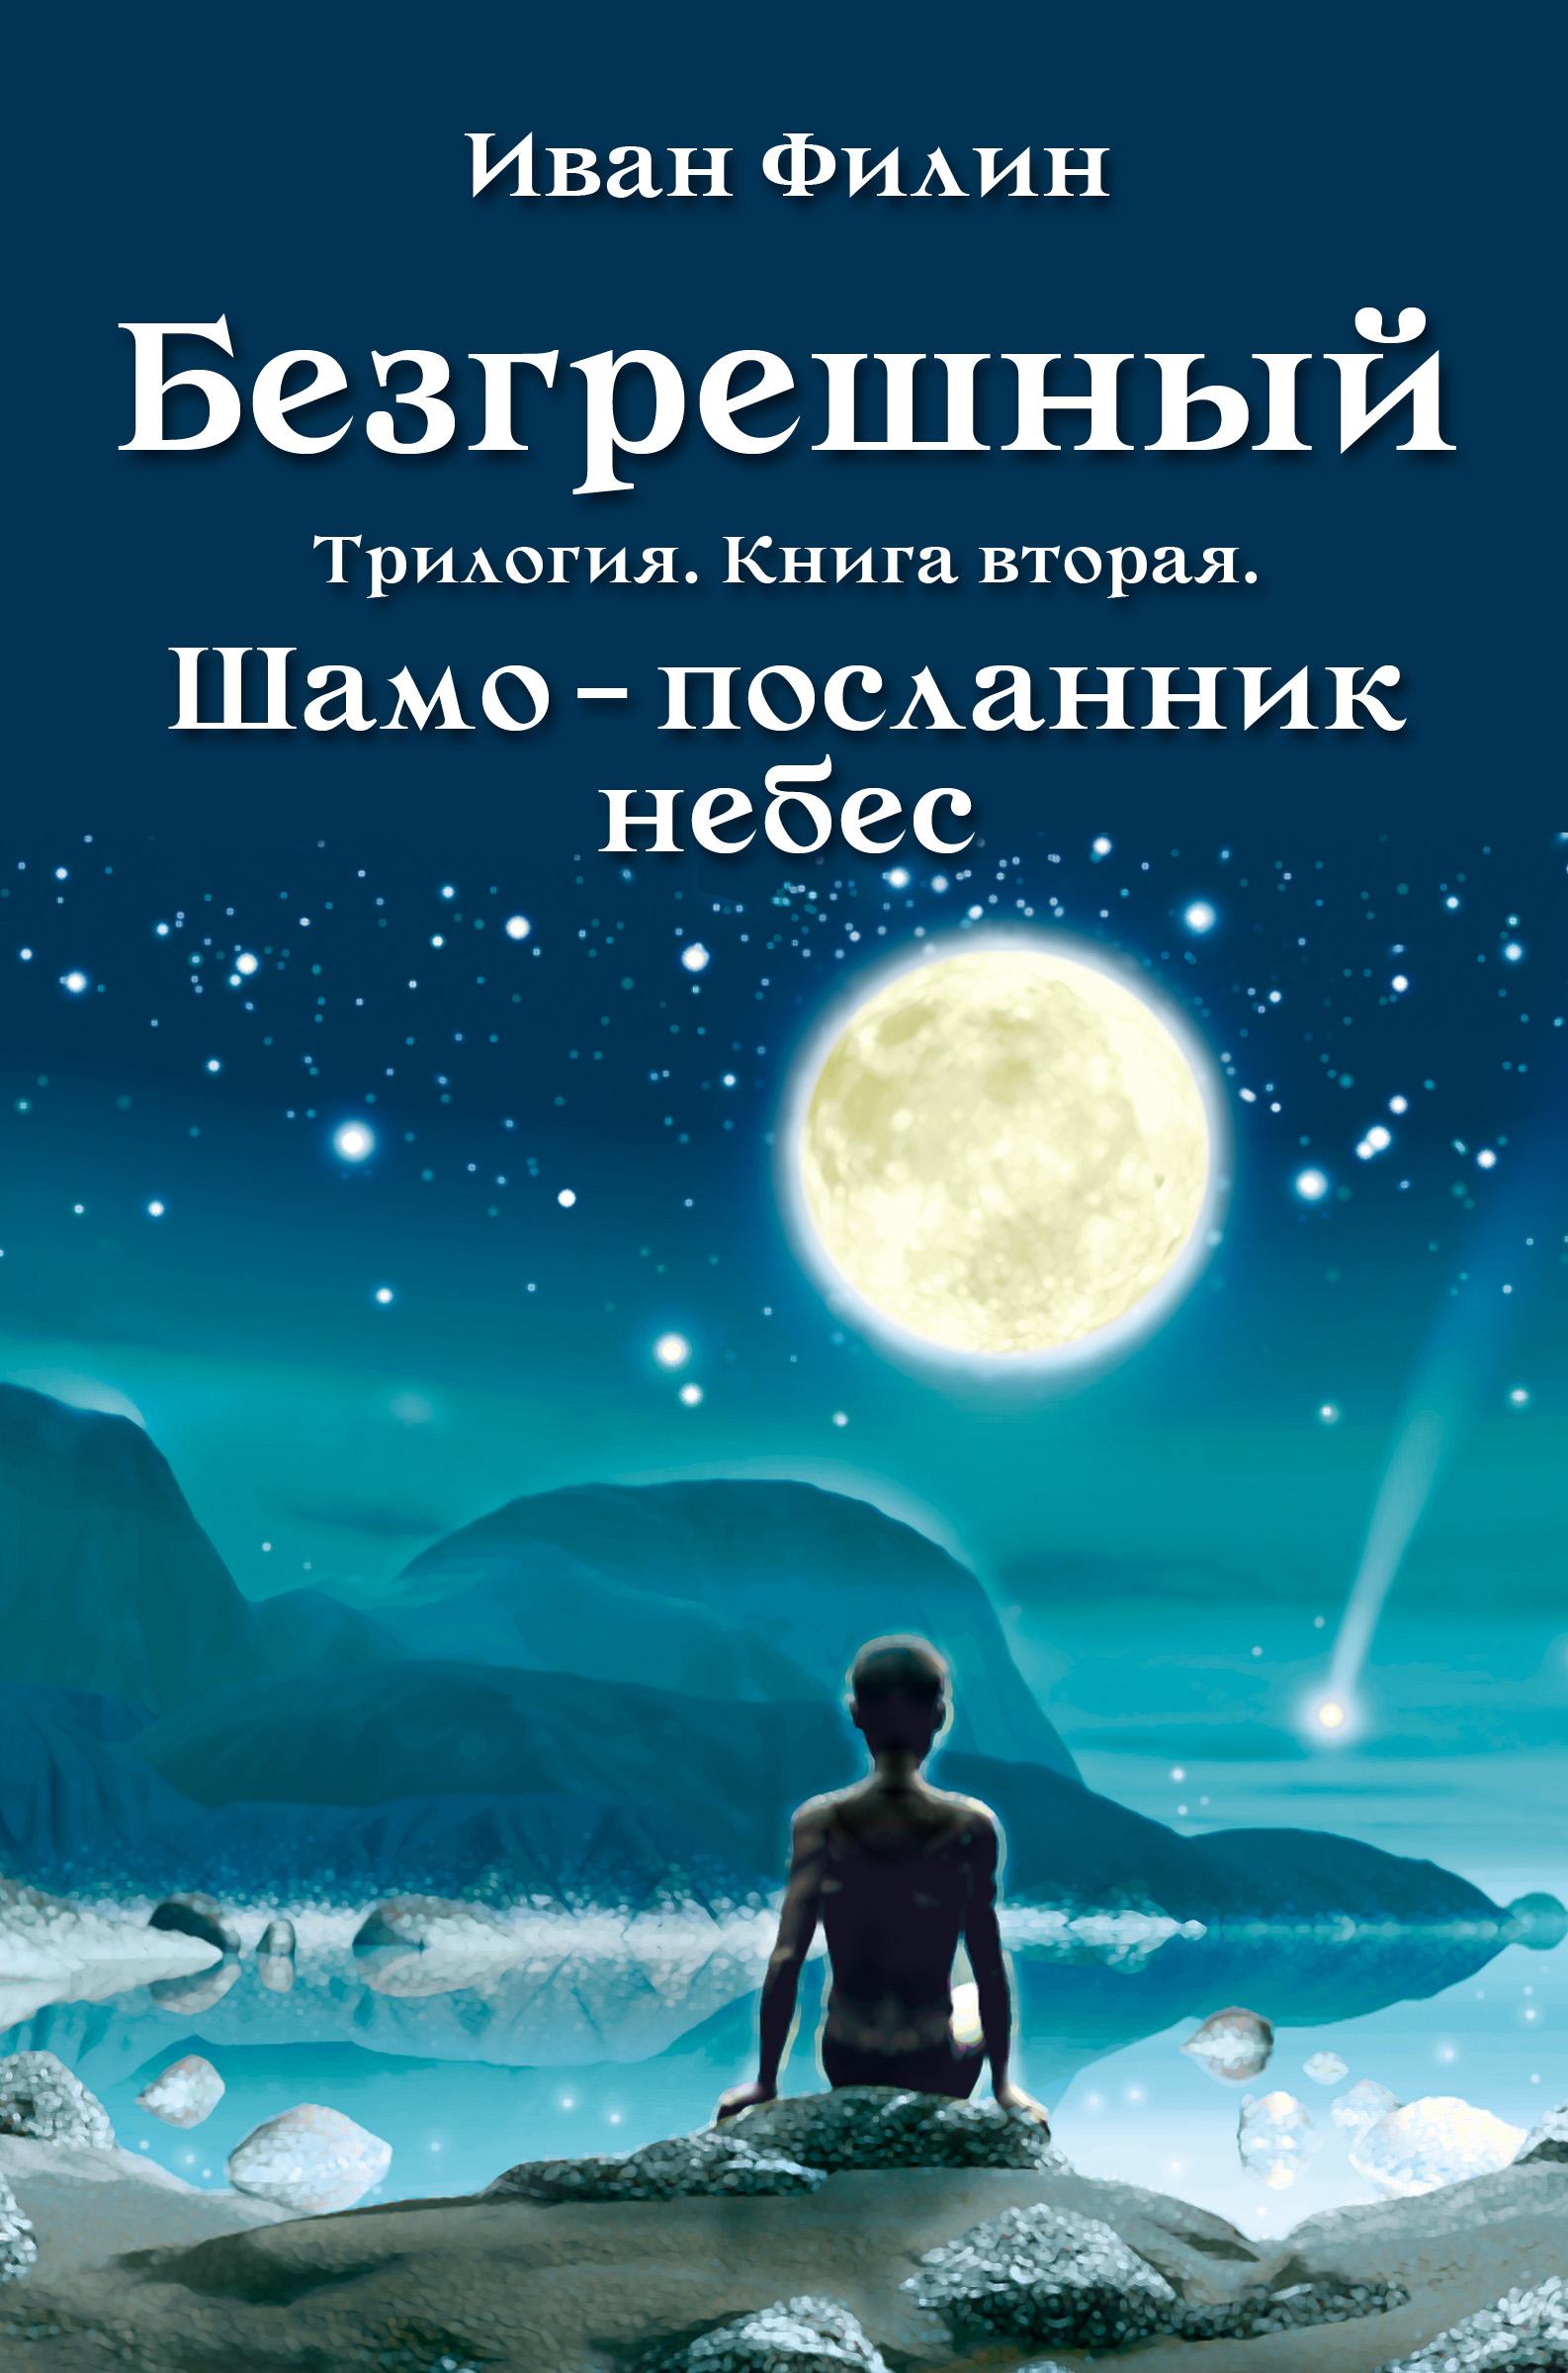 Иван Филин Шамо – посланник небес цена